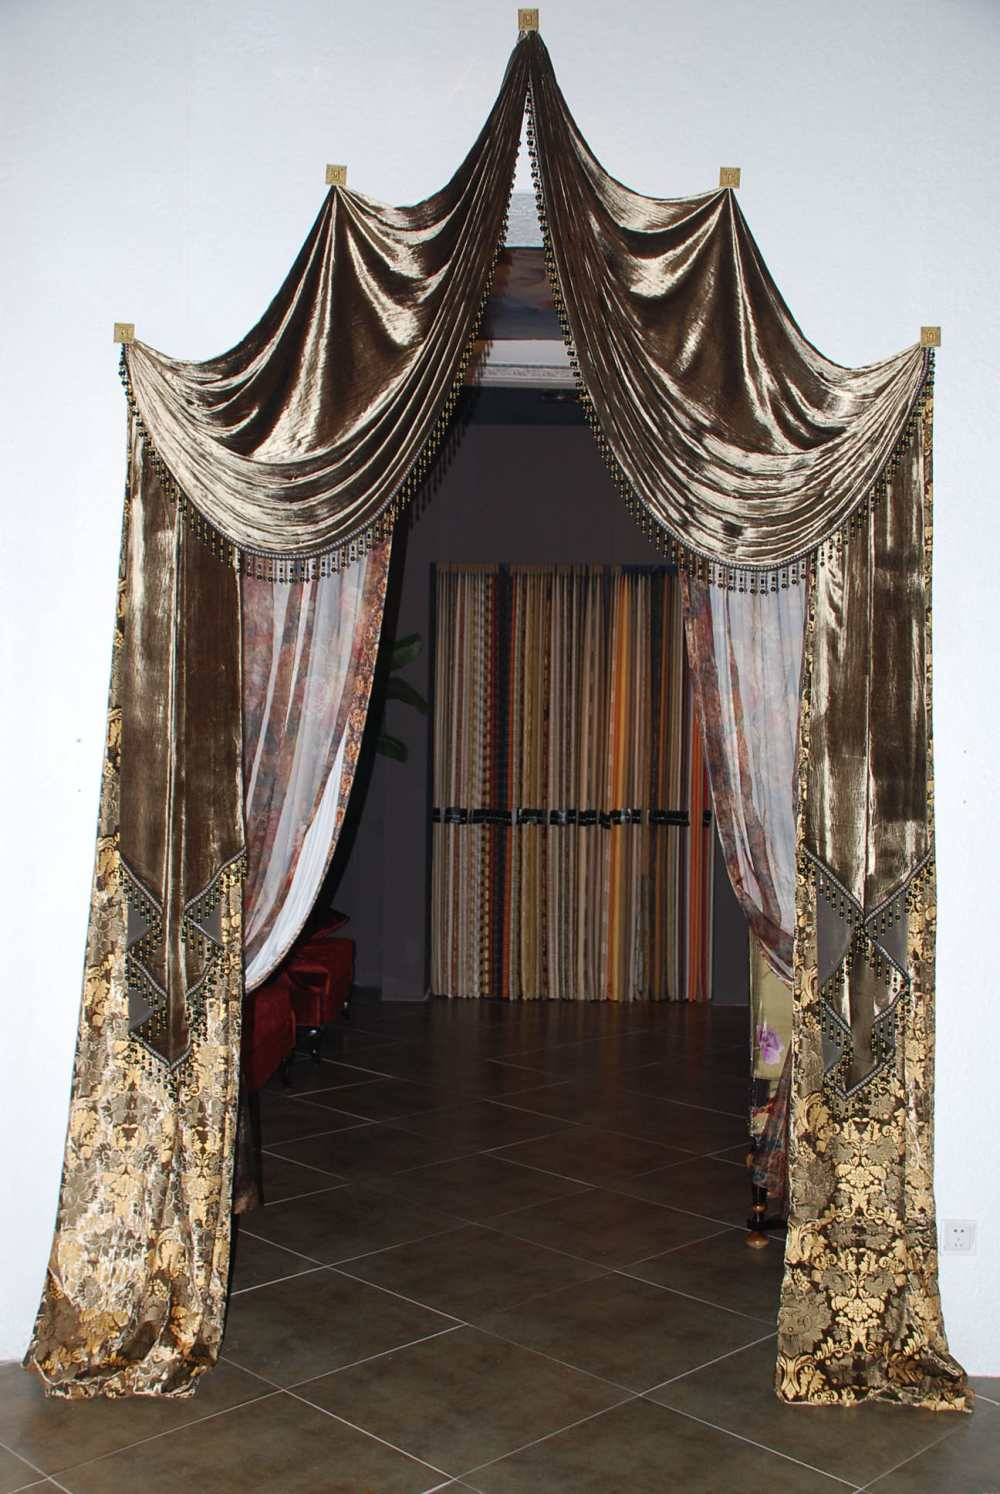 Aiden 收藏窗帘图片高清图(用方案里很清晰。)免费~_05.JPG